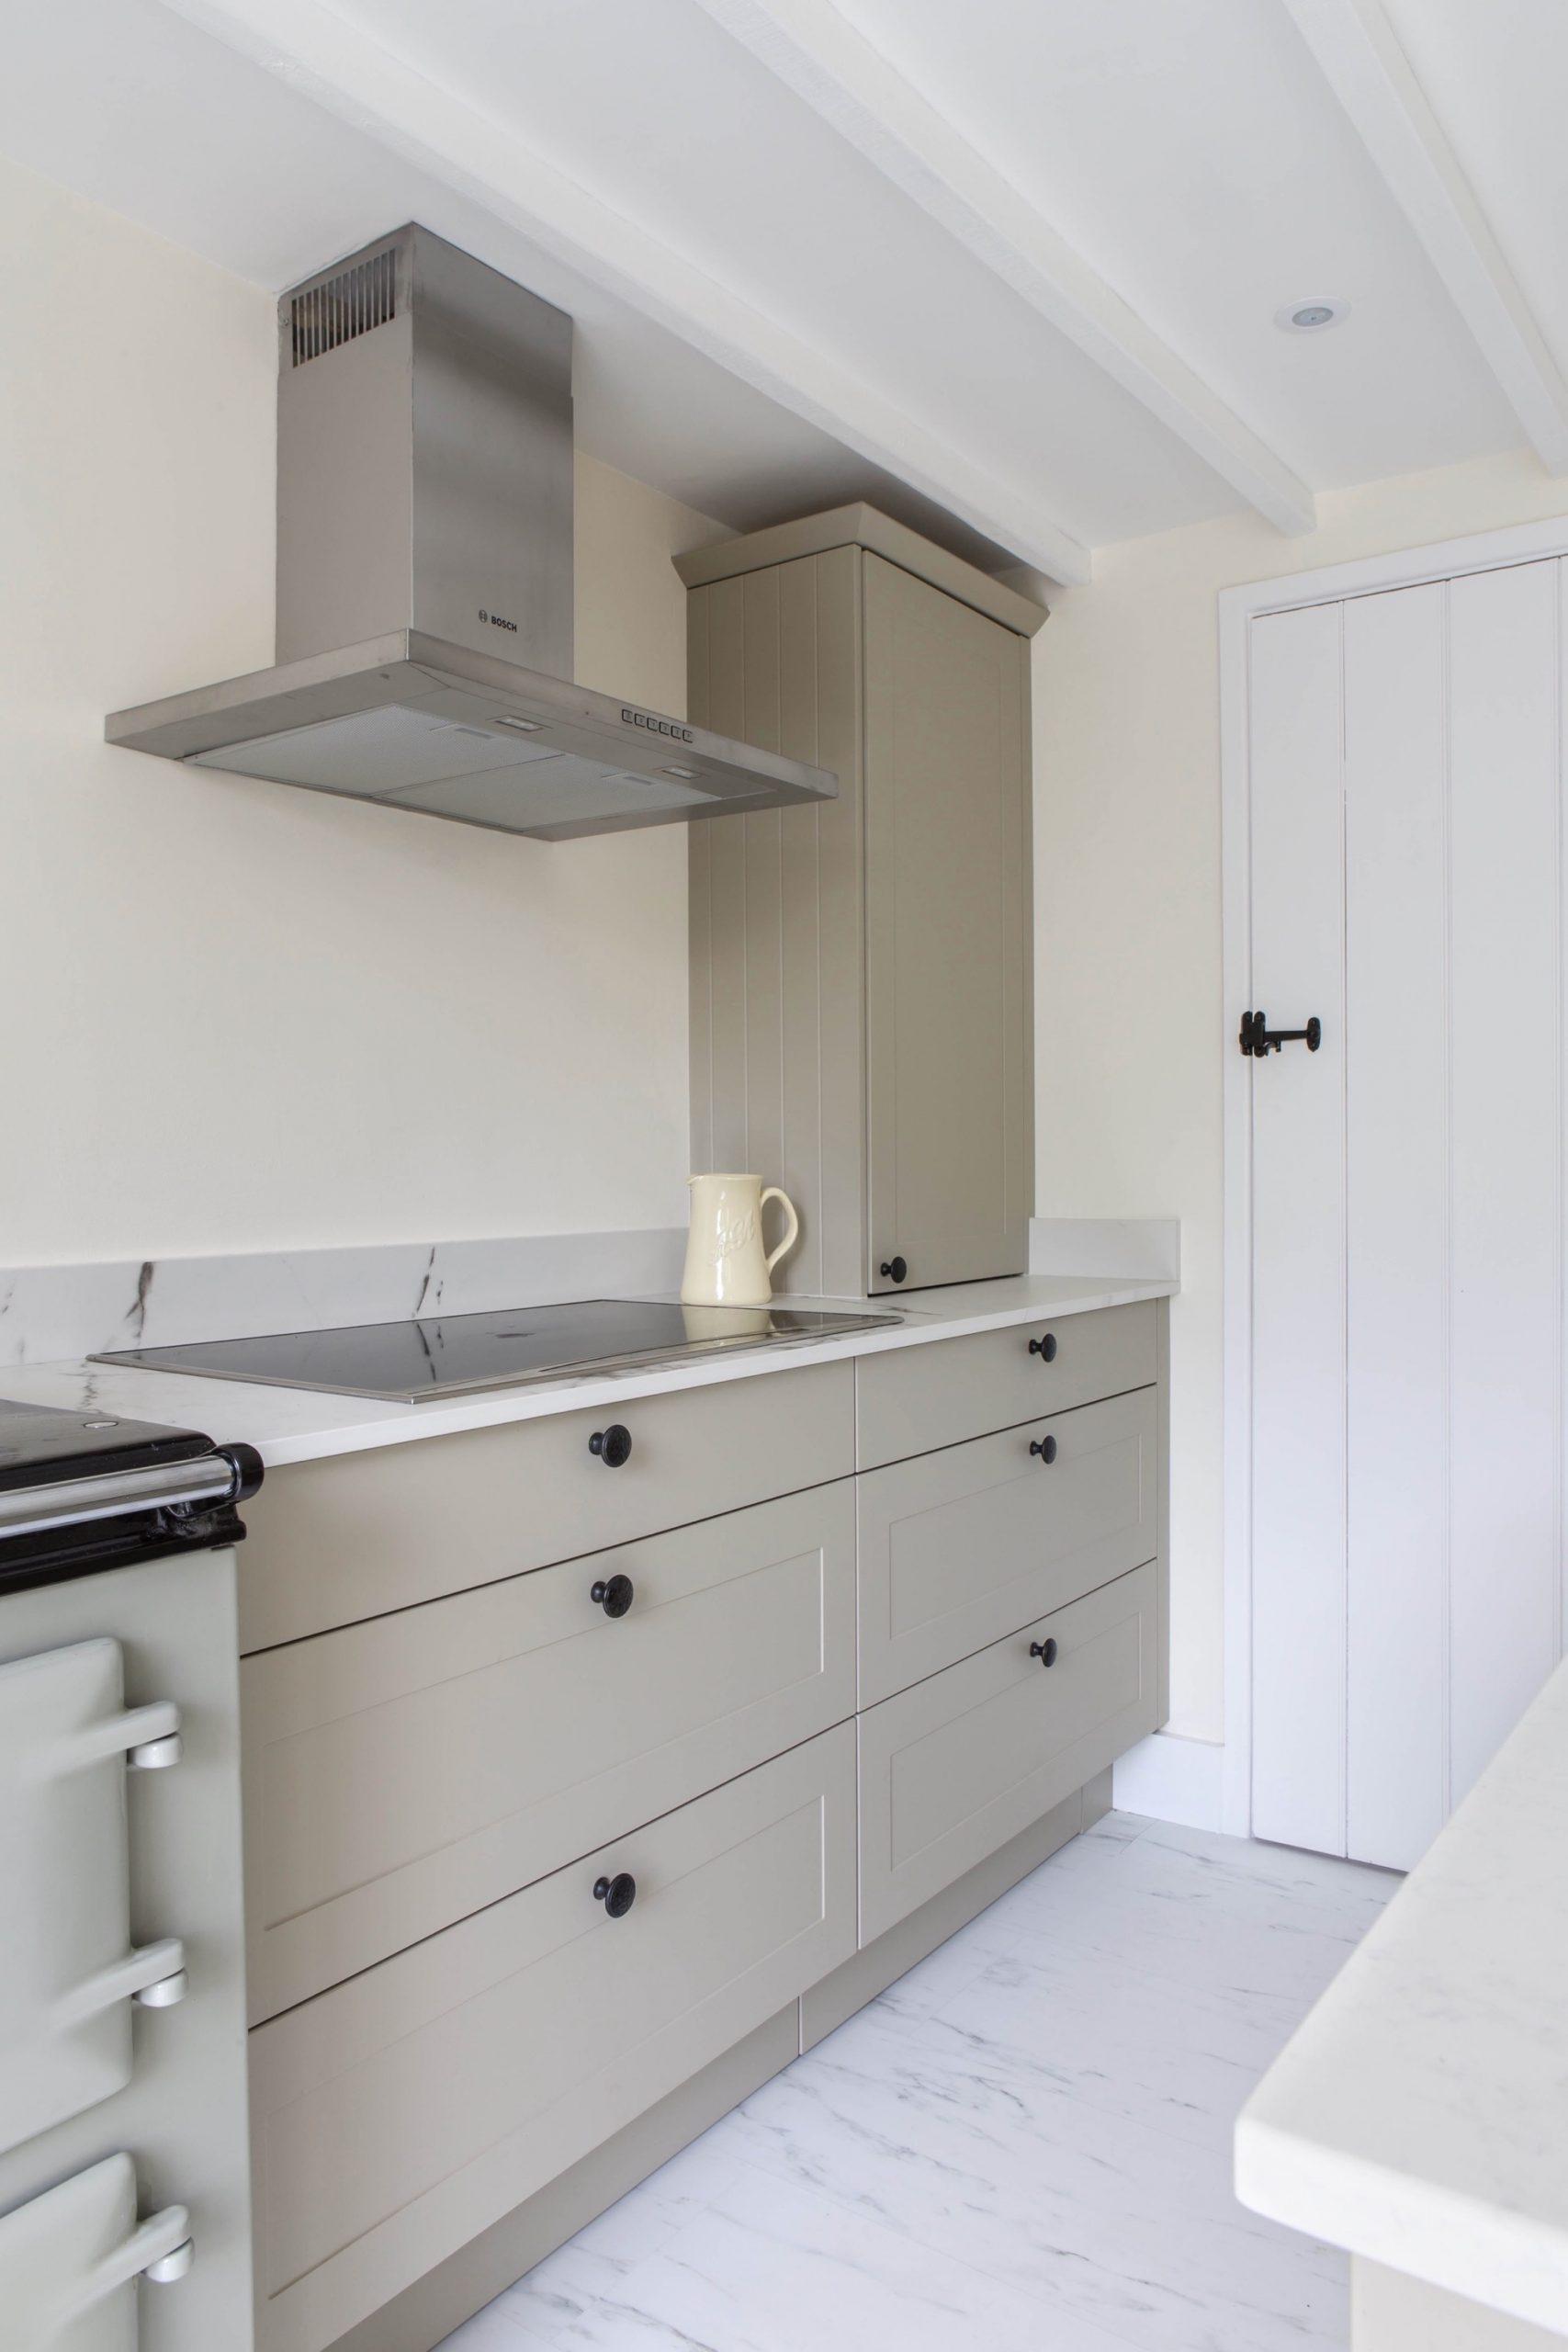 pan drawers induction hob worktop dresser worminghall oakley buckinghamshire scaled